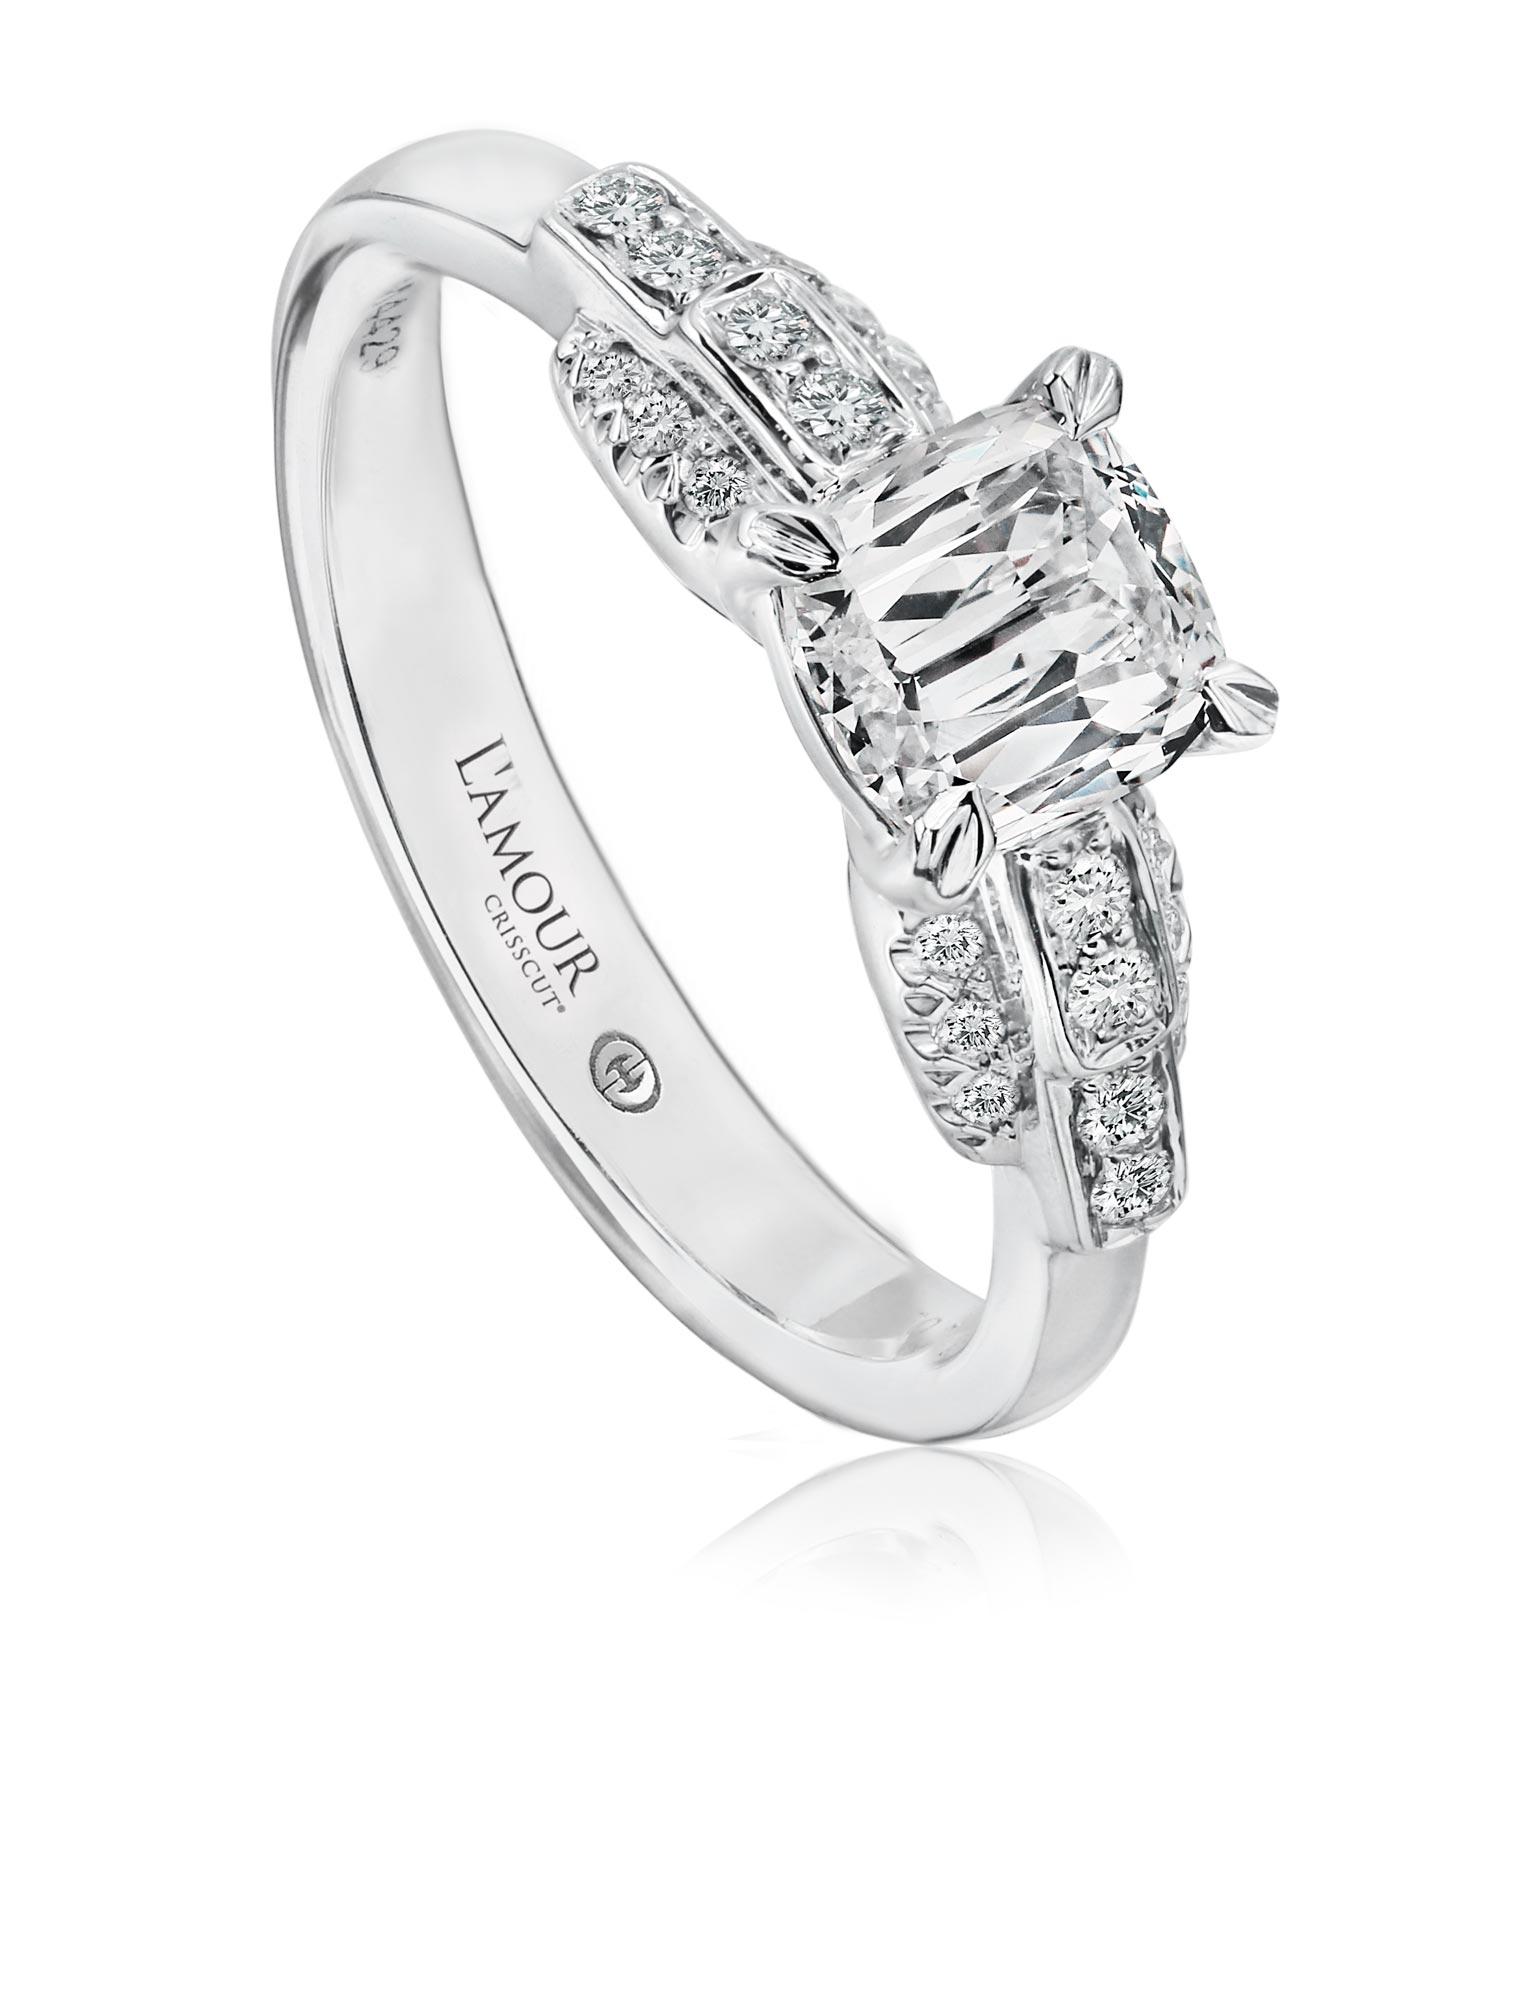 Simple Engagement Ring With Cushion Cut Diamond And Round Diamond Setting L502 Lcu060 S Crisscut Diamond Jewelry